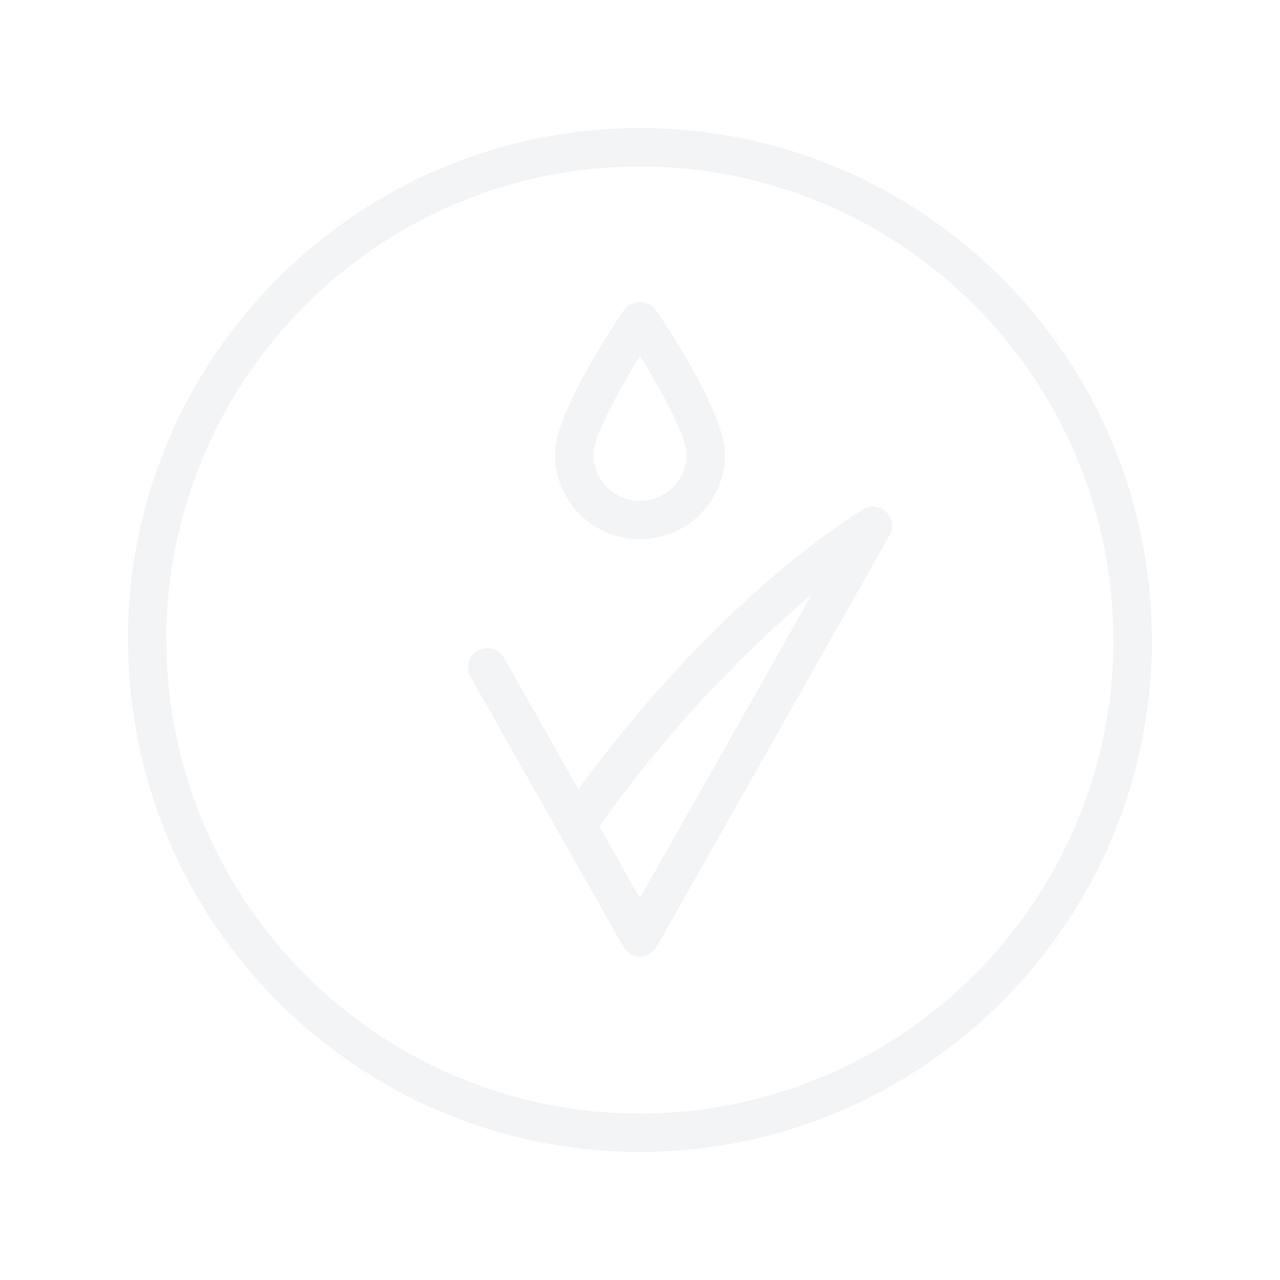 ROBERTO CAVALLI Florence 50ml Eau De Parfum Gift Set